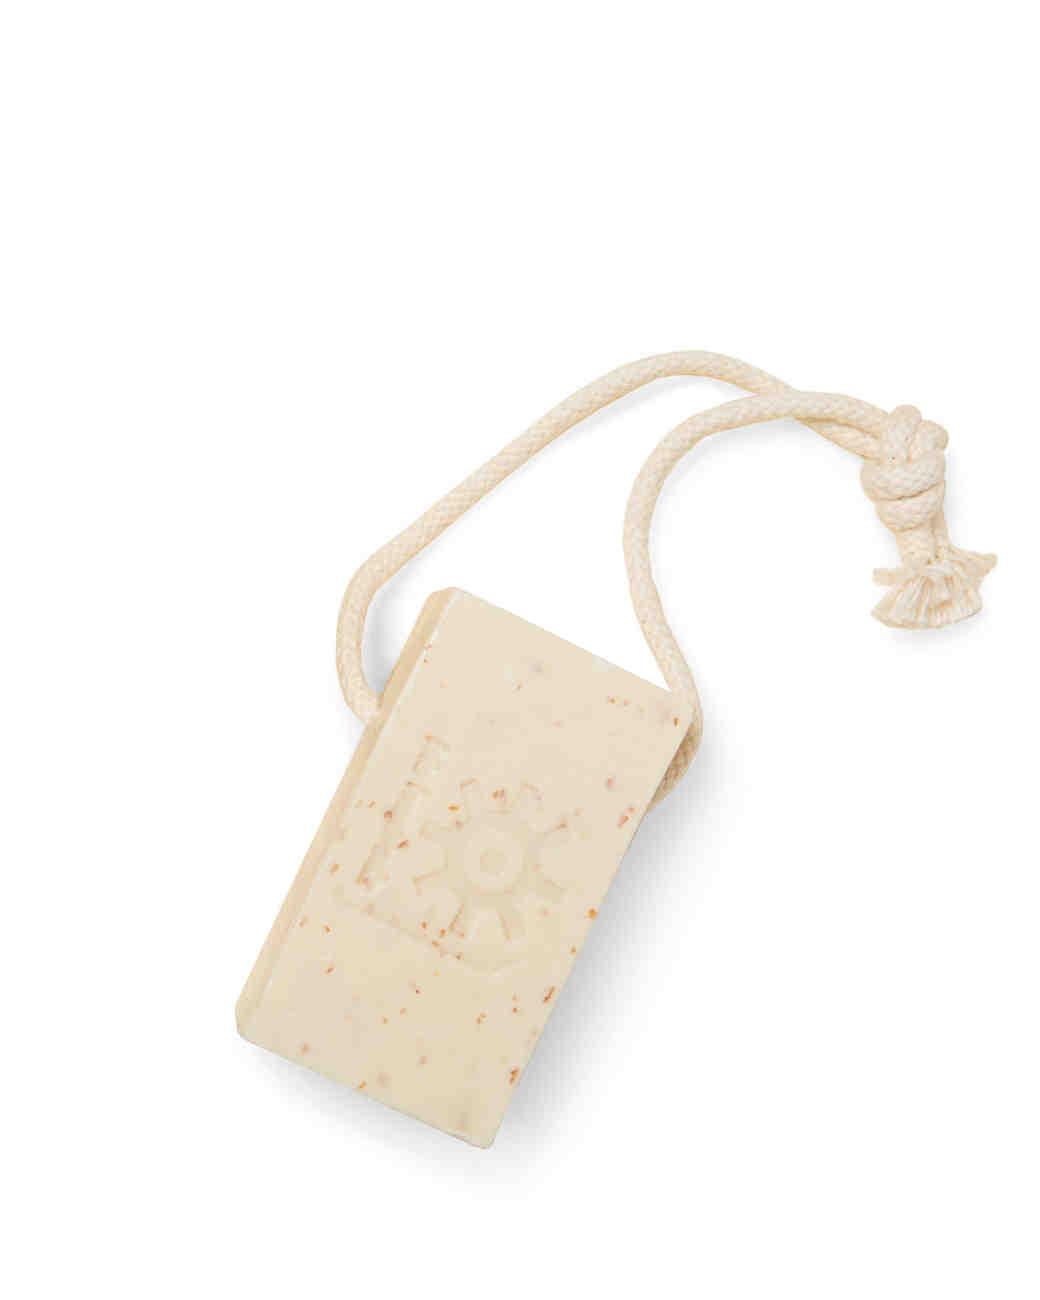 iris hantverk soap